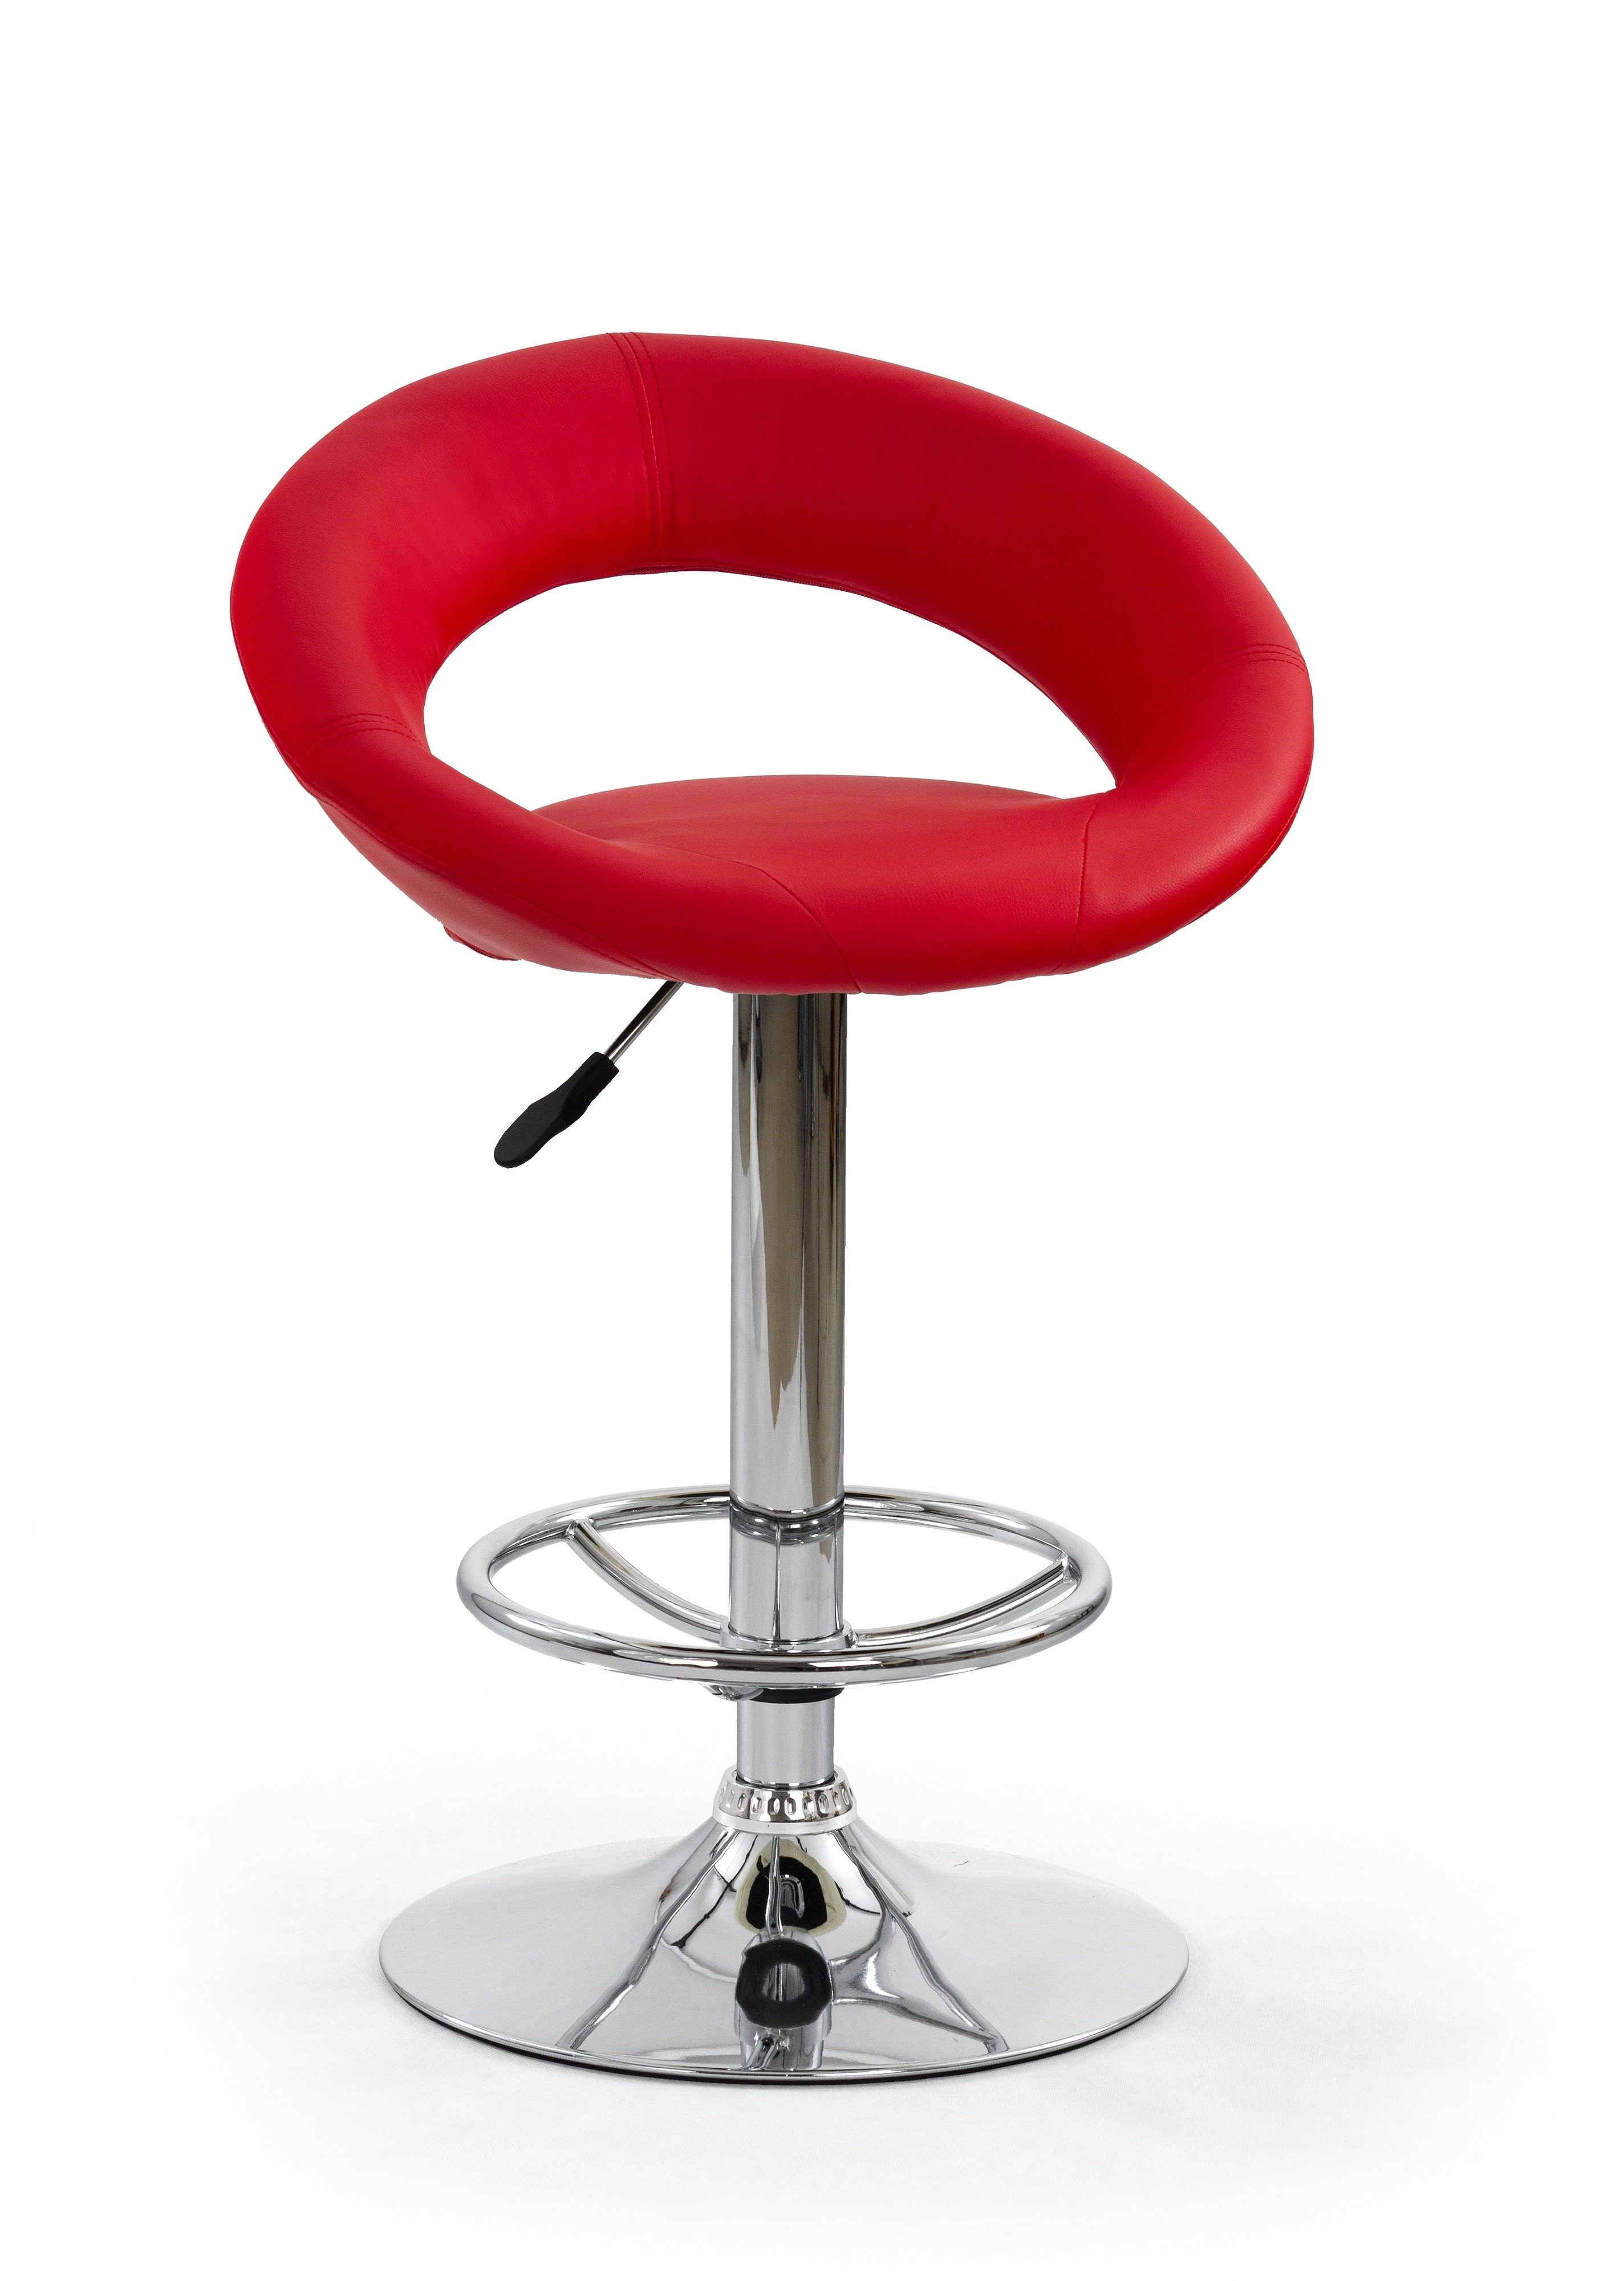 Scaun de bar tapitat cu piele ecologica, cu picior metalic H-15 Red, l54xA46xH80-102 cm imagine